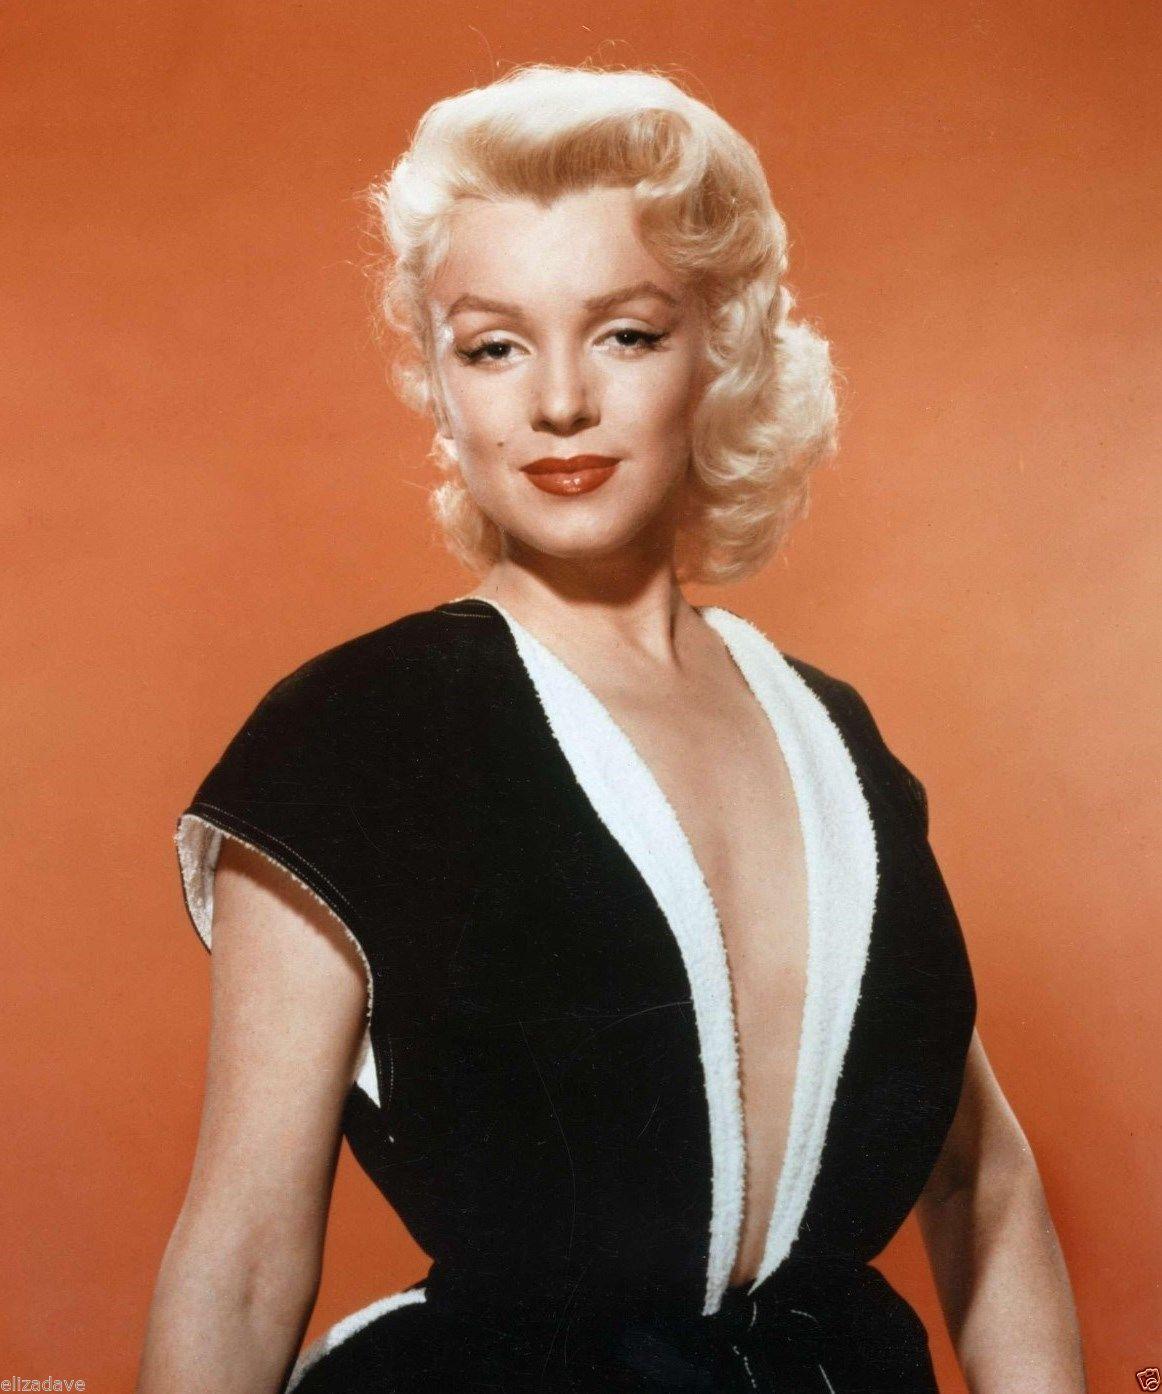 MARILYN MONROE in Low Neckline Dress Rare 8x10 Photo   eBay